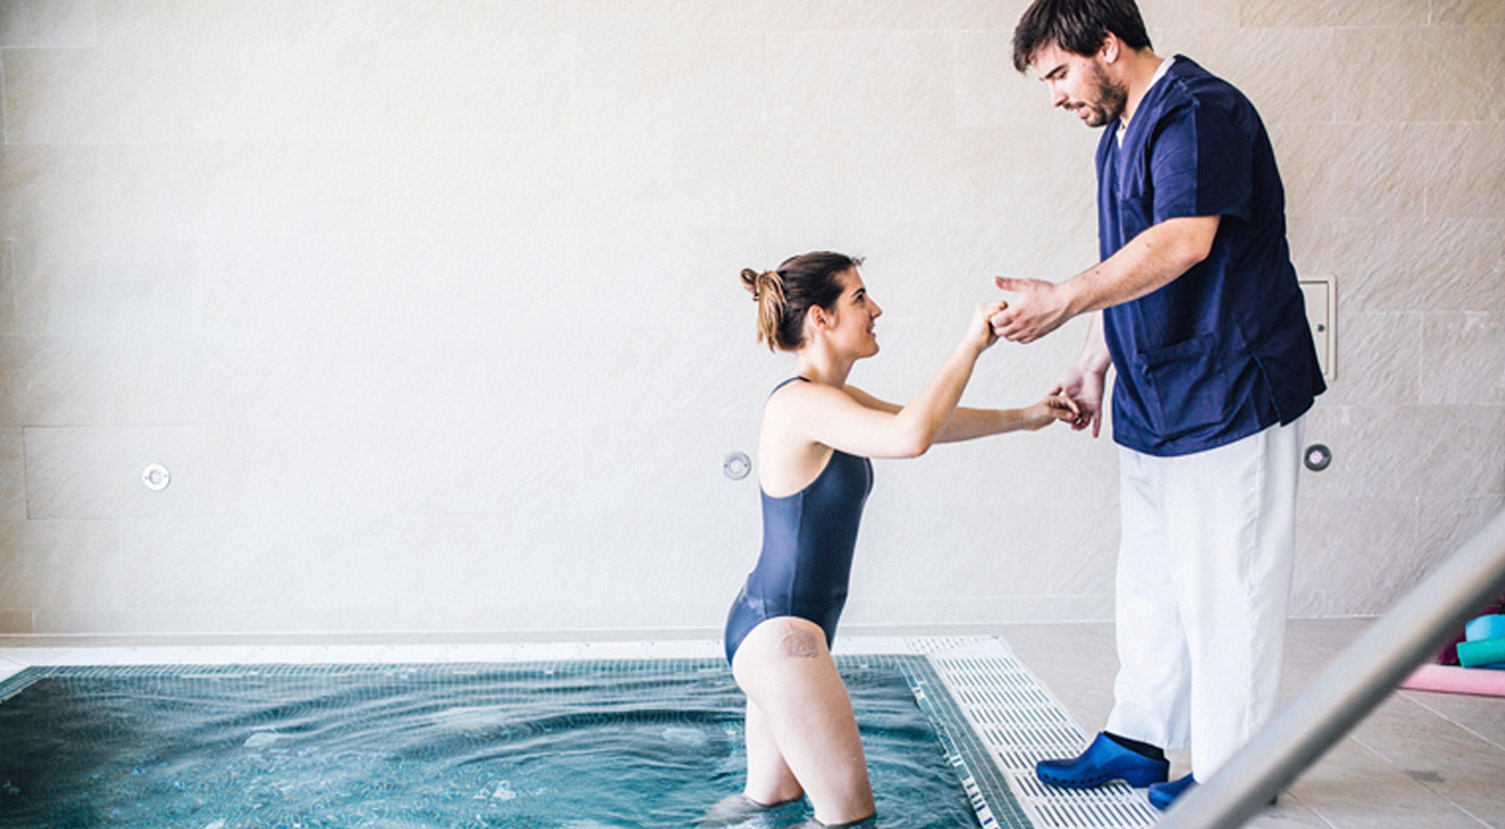 Una forma distinta de hacer fisioterapia rehabilitaci n for Rehabilitacion en piscina